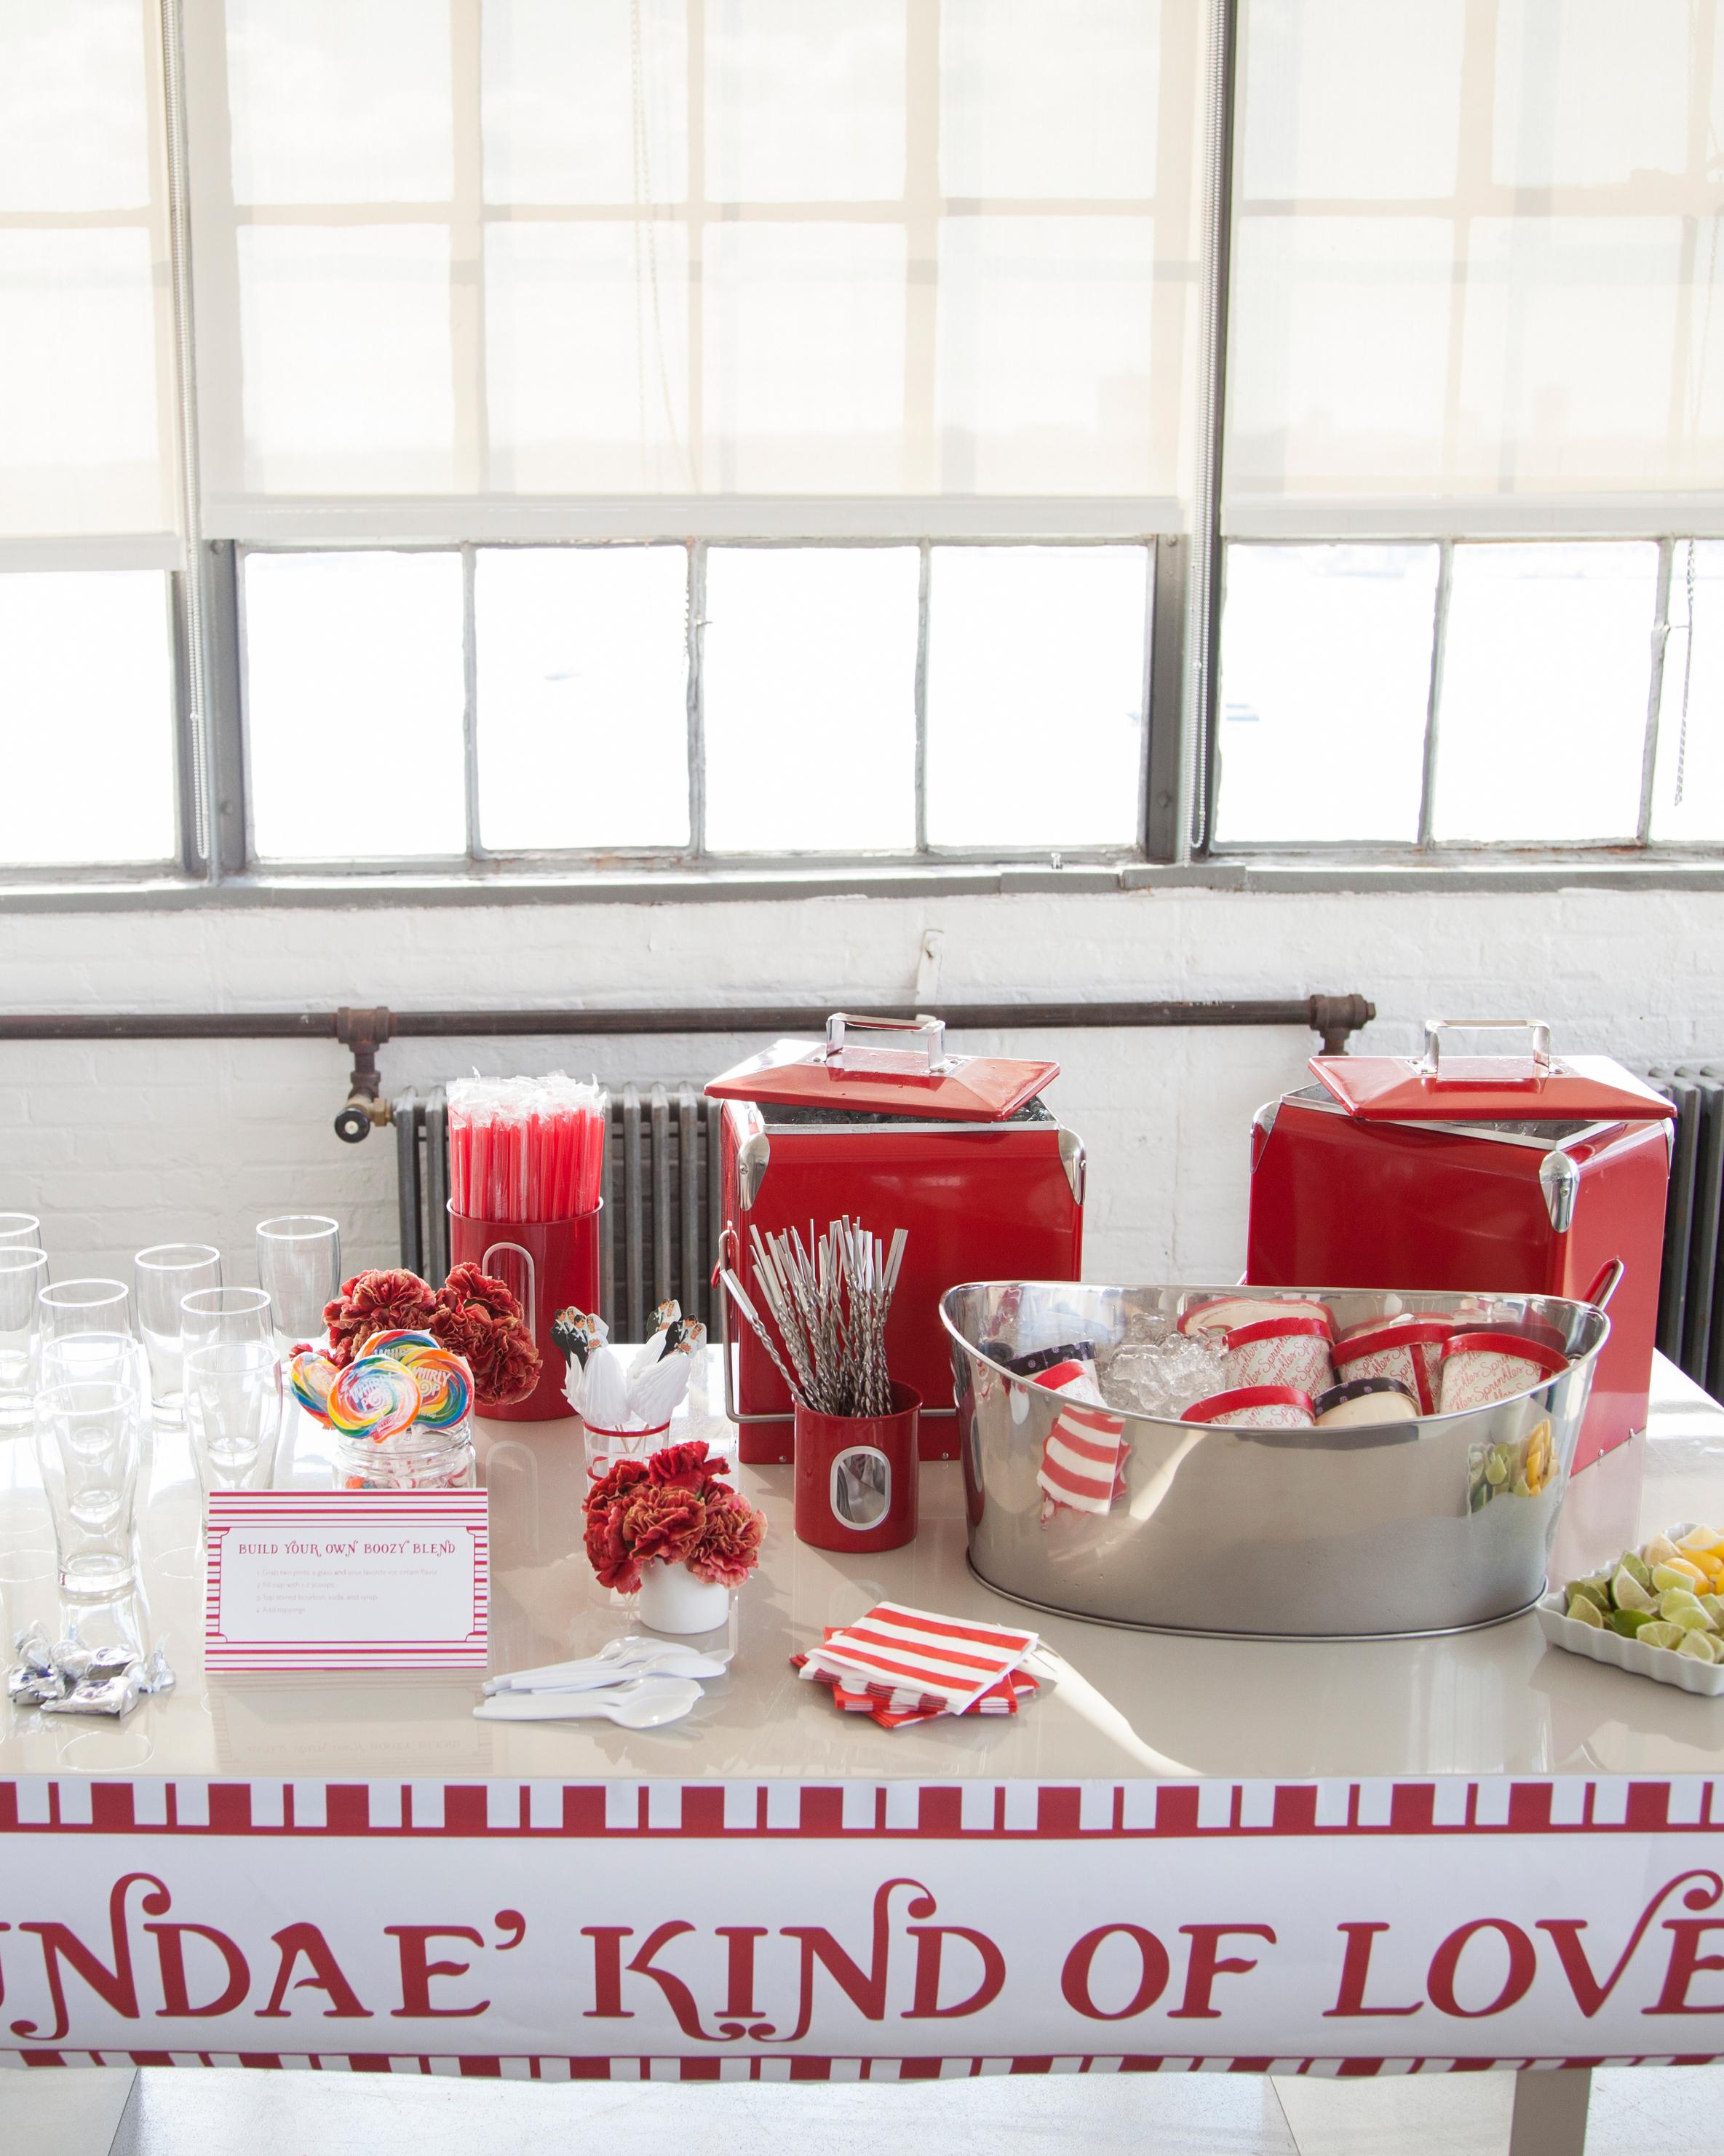 retro-ice-cream-parlor-bridal-shower-ice-cream-bar-wide-shot-0815.jpg